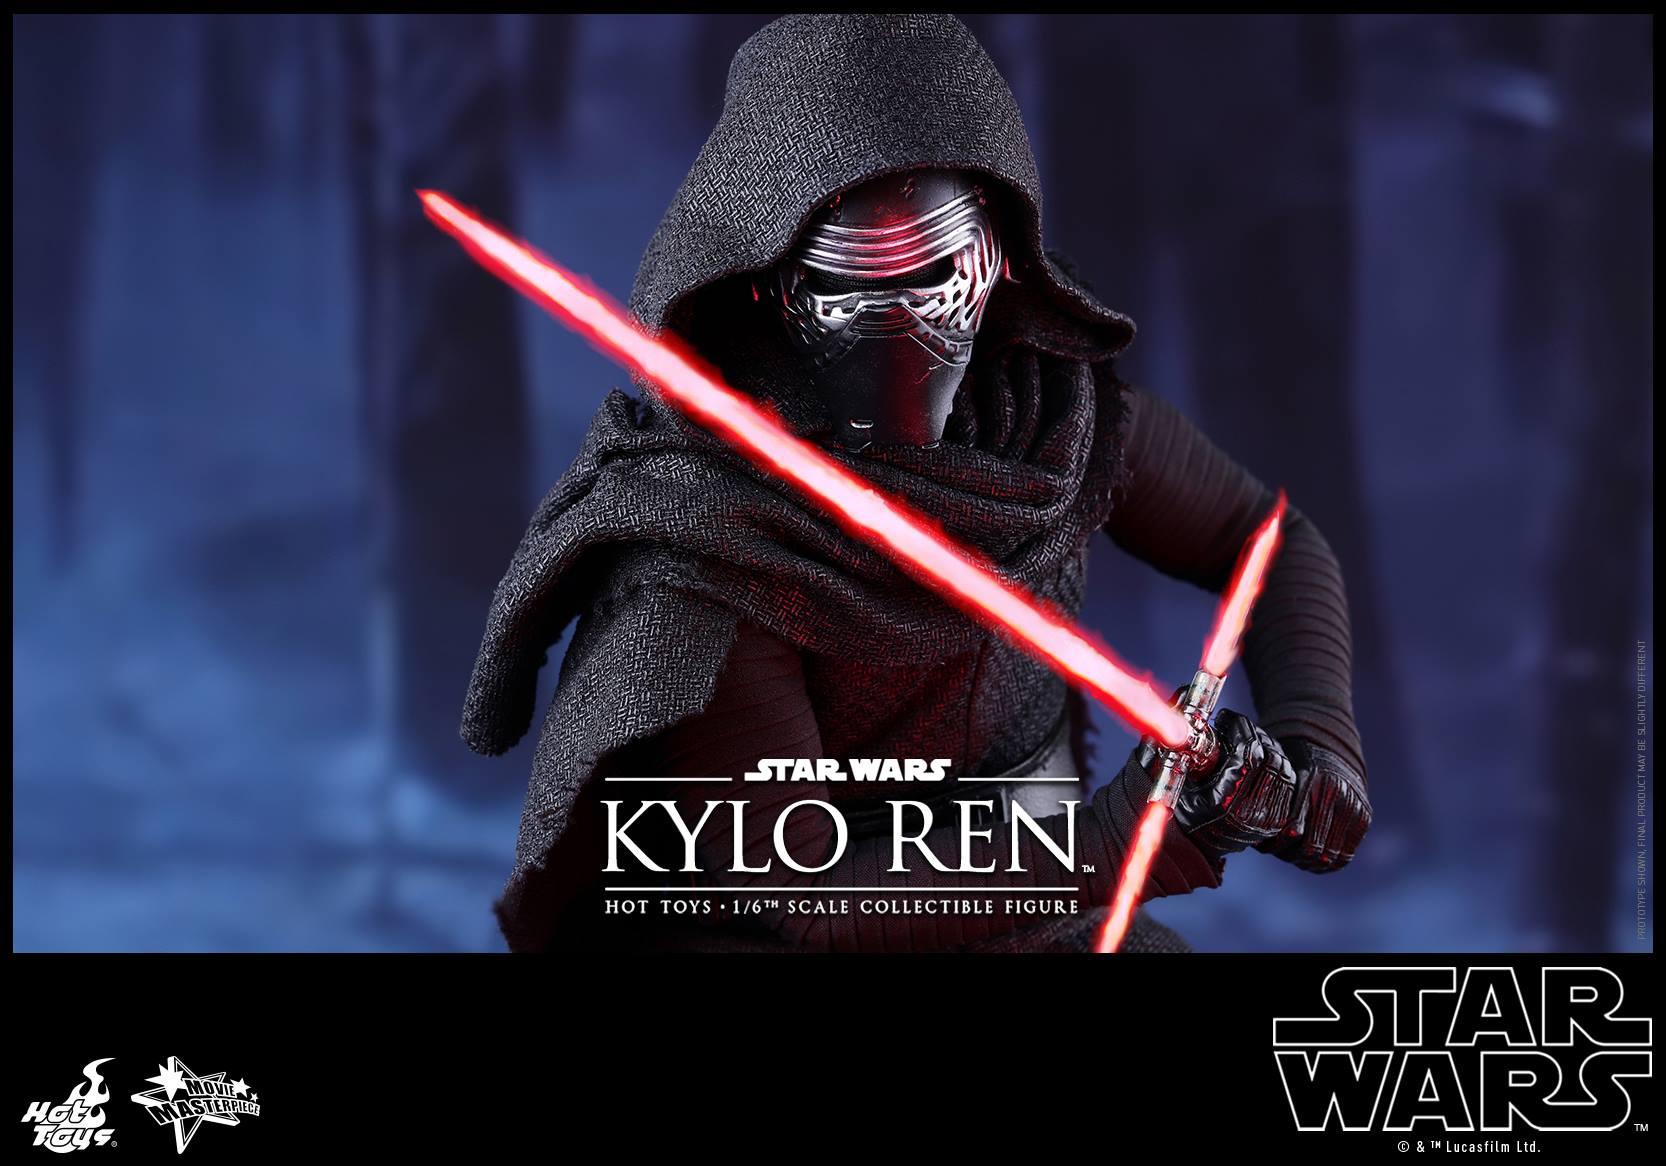 Hot Toys - Kylo Ren